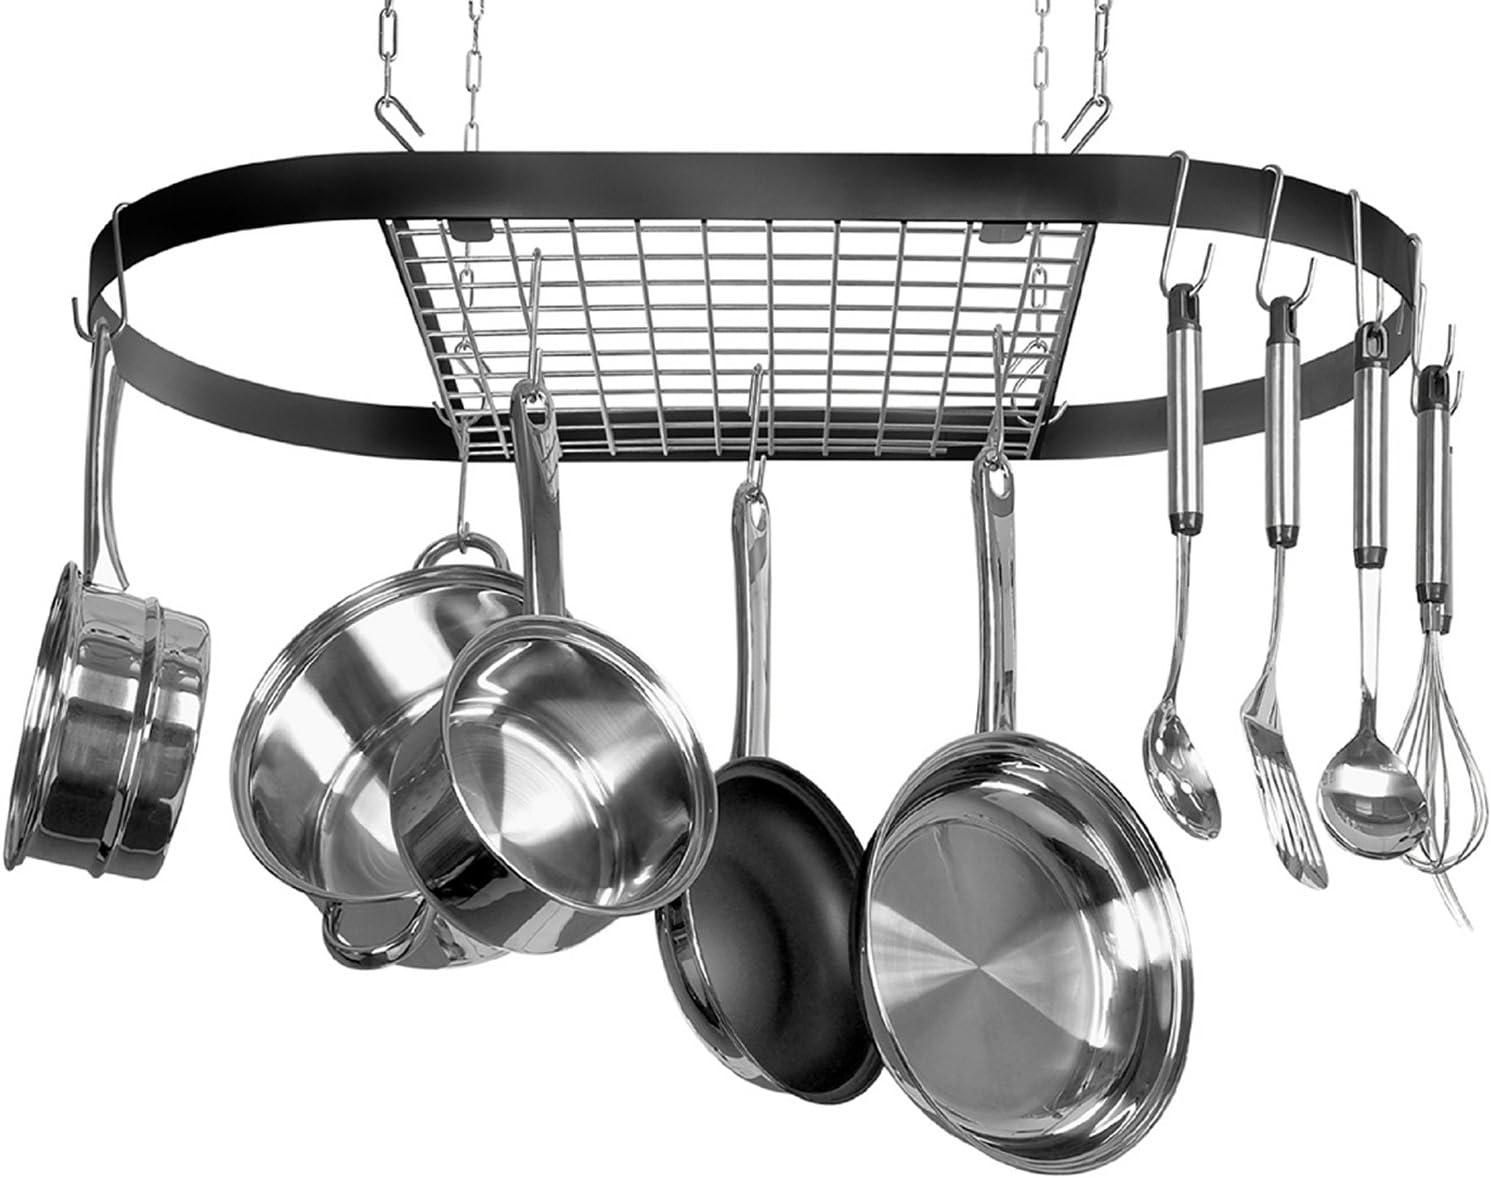 Kinetic Pot, Black with Silver Rack: Kitchen Pot Racks: Kitchen & Dining